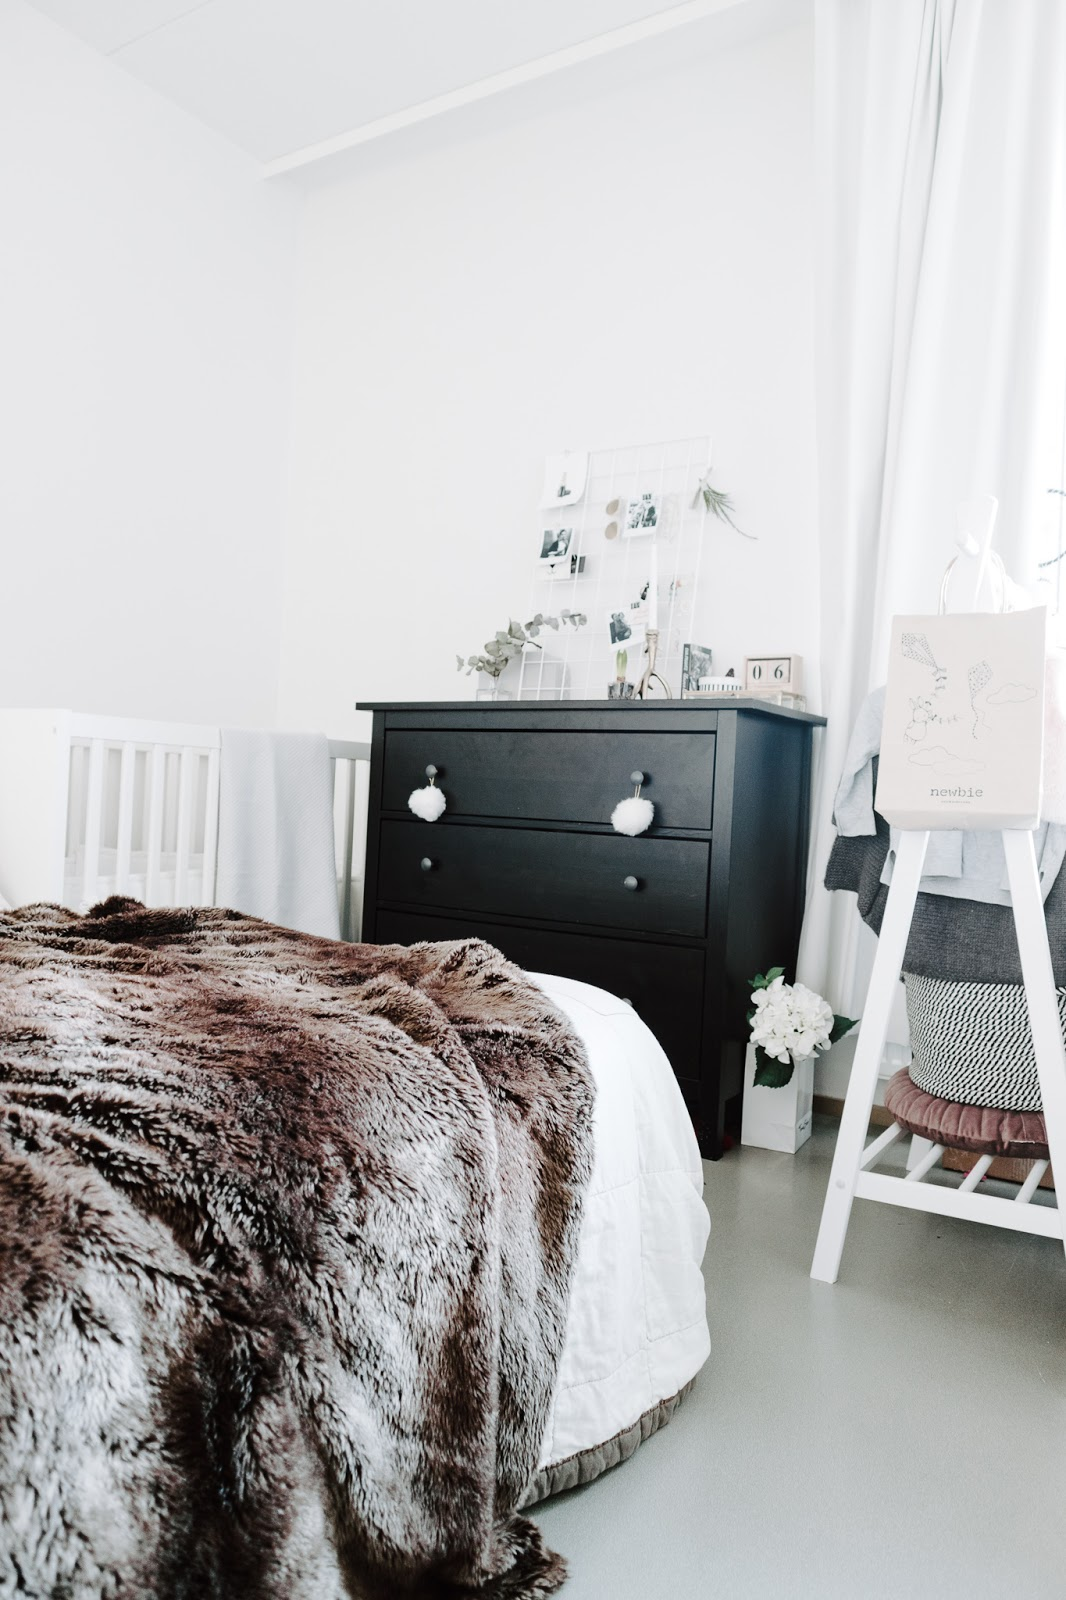 makuuhuone, sisustus, sisustushaaveet, koti, kaksio,